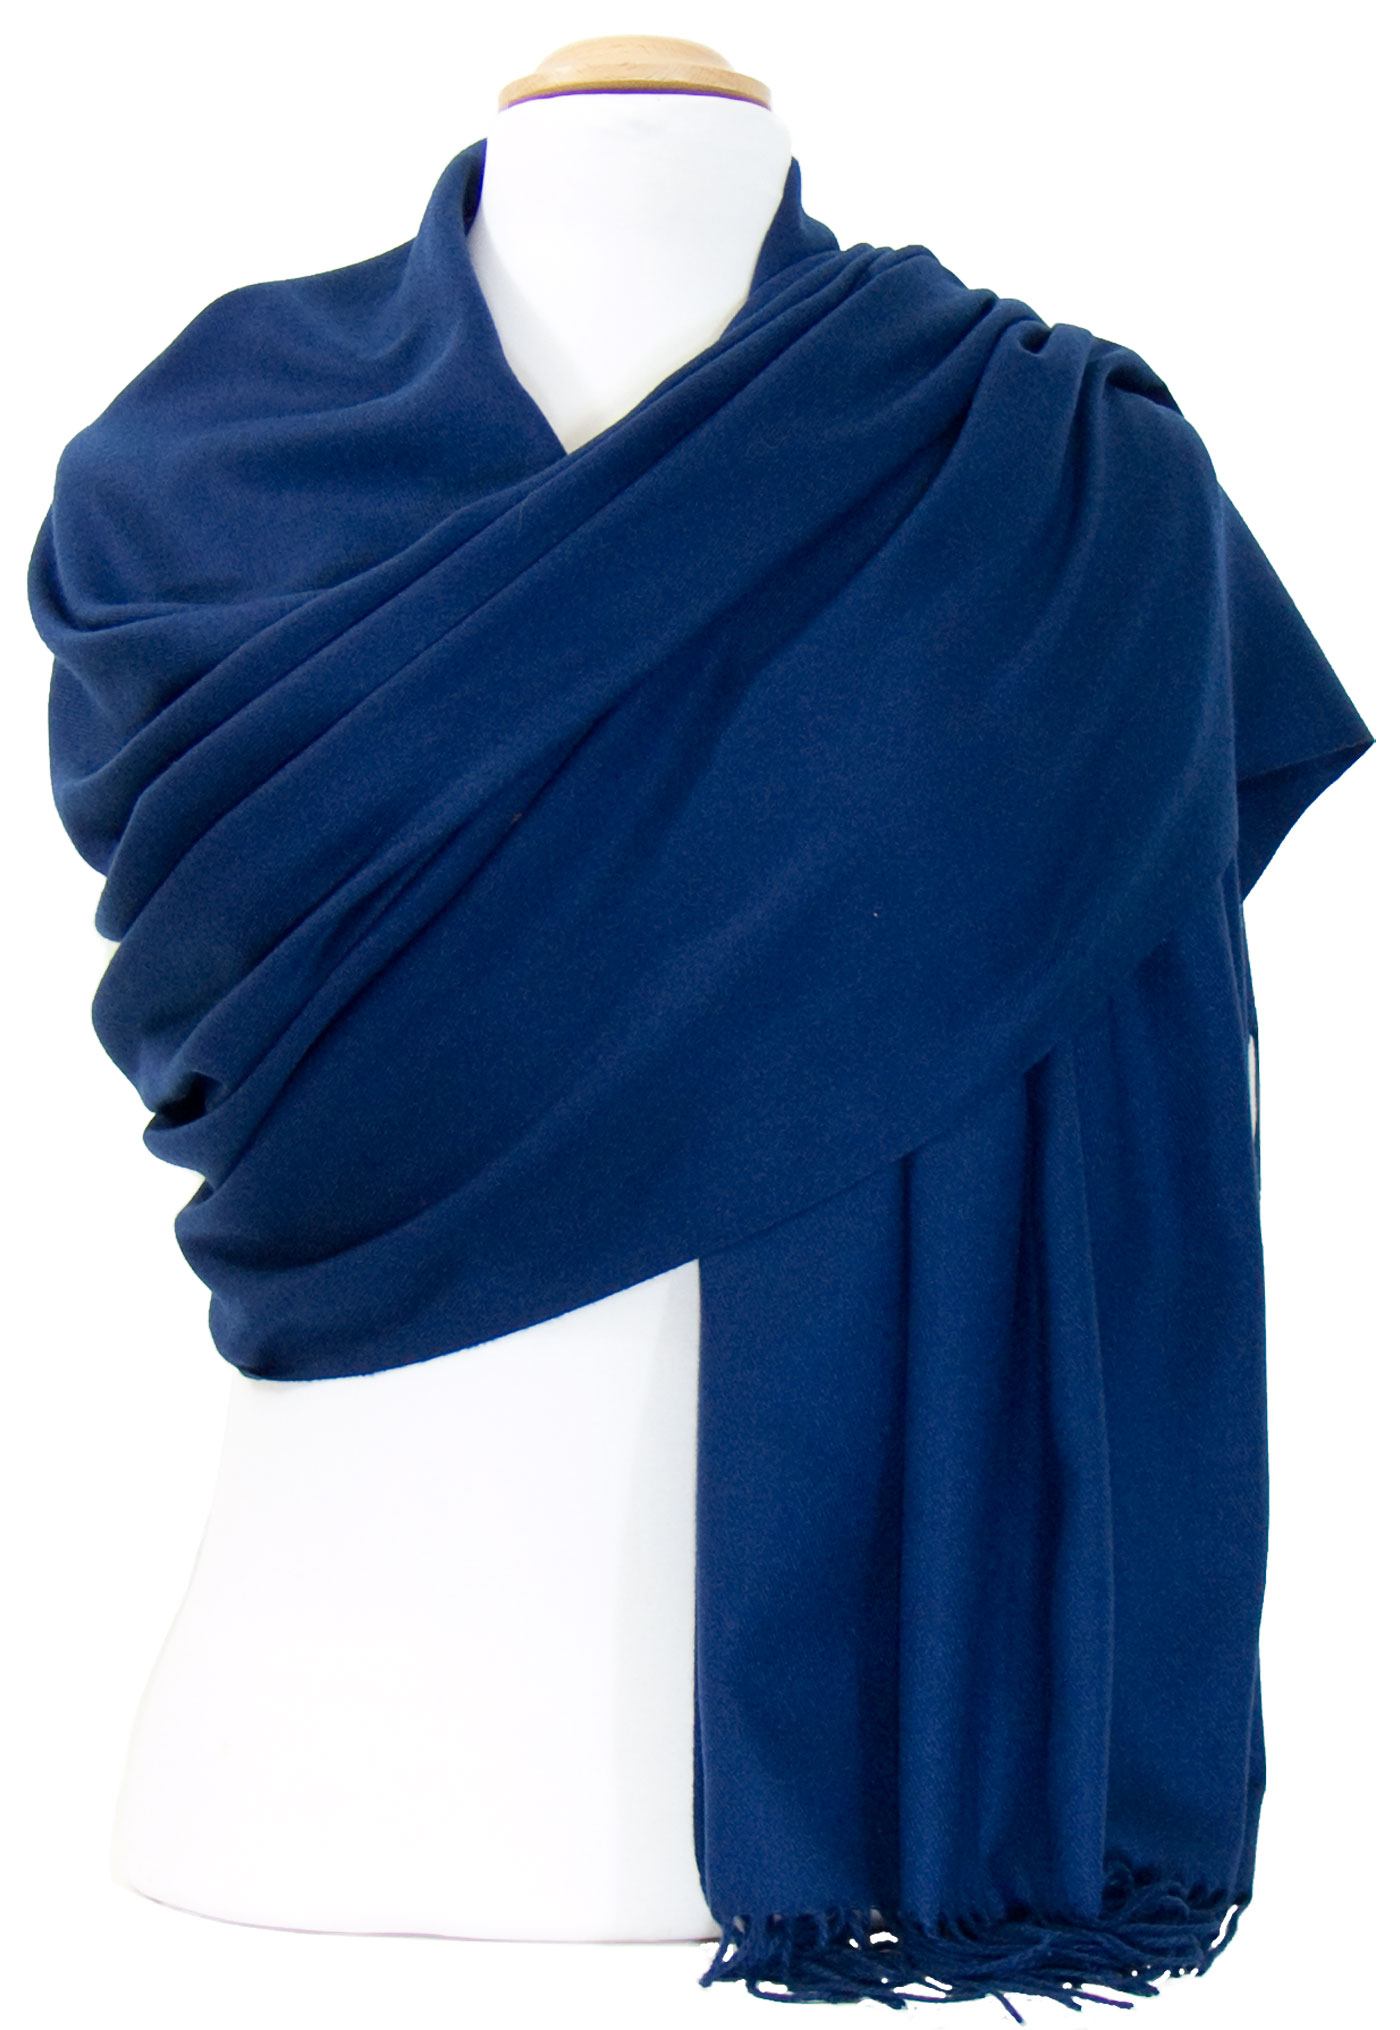 Etole cachemire laine bleu marine Charlie